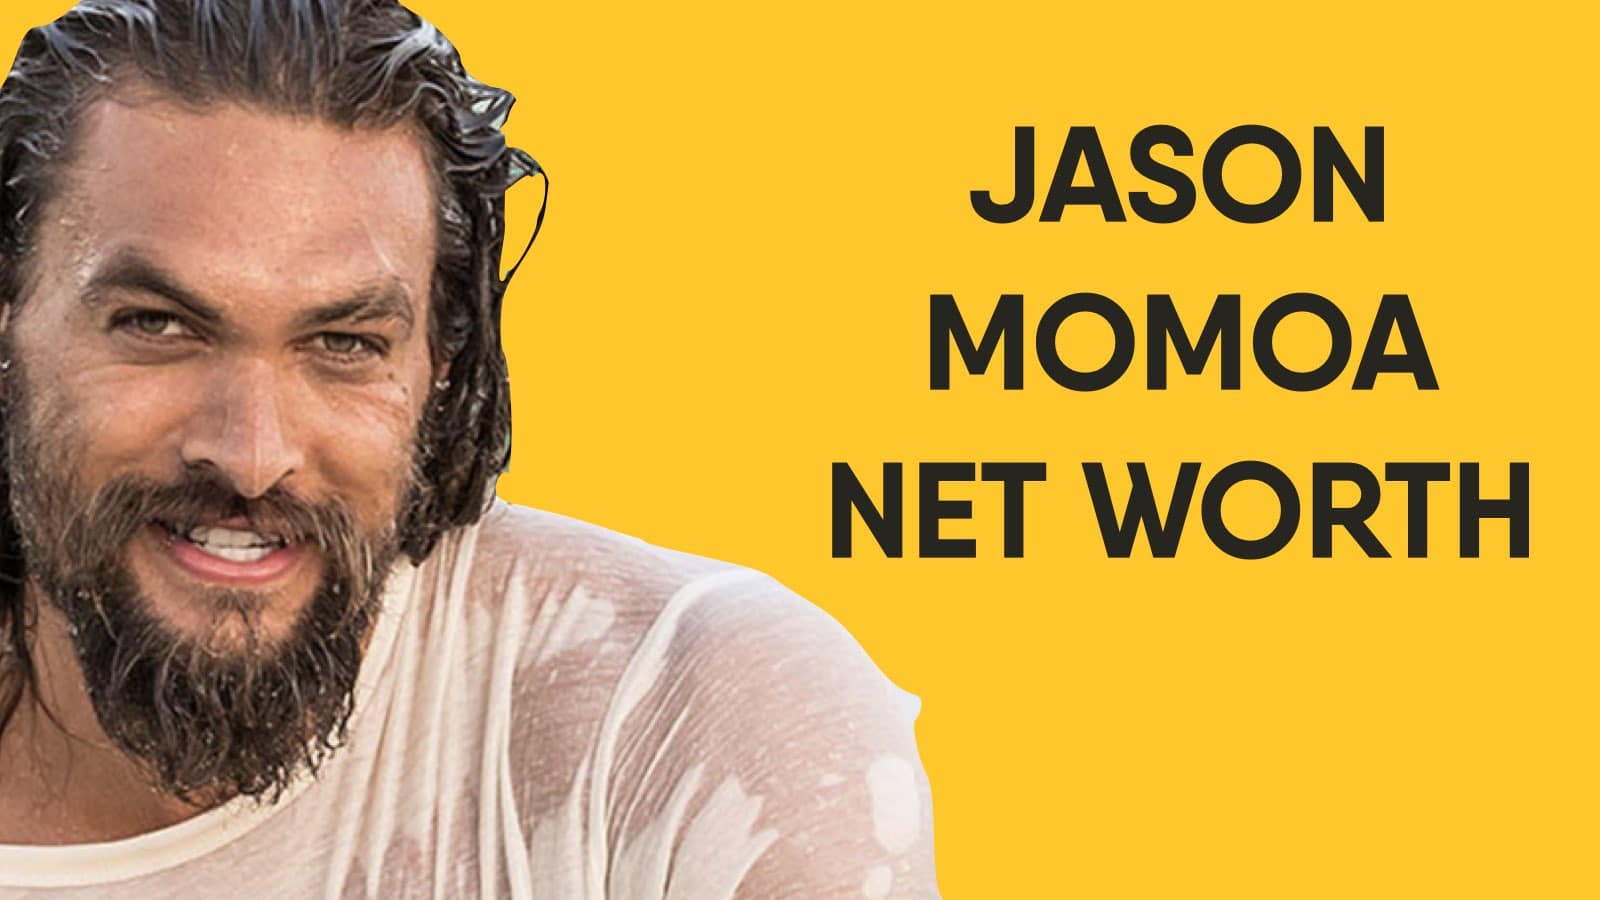 Jason Momoa Net Worth and Earnings in 2020 Jason Momoa Net Worth